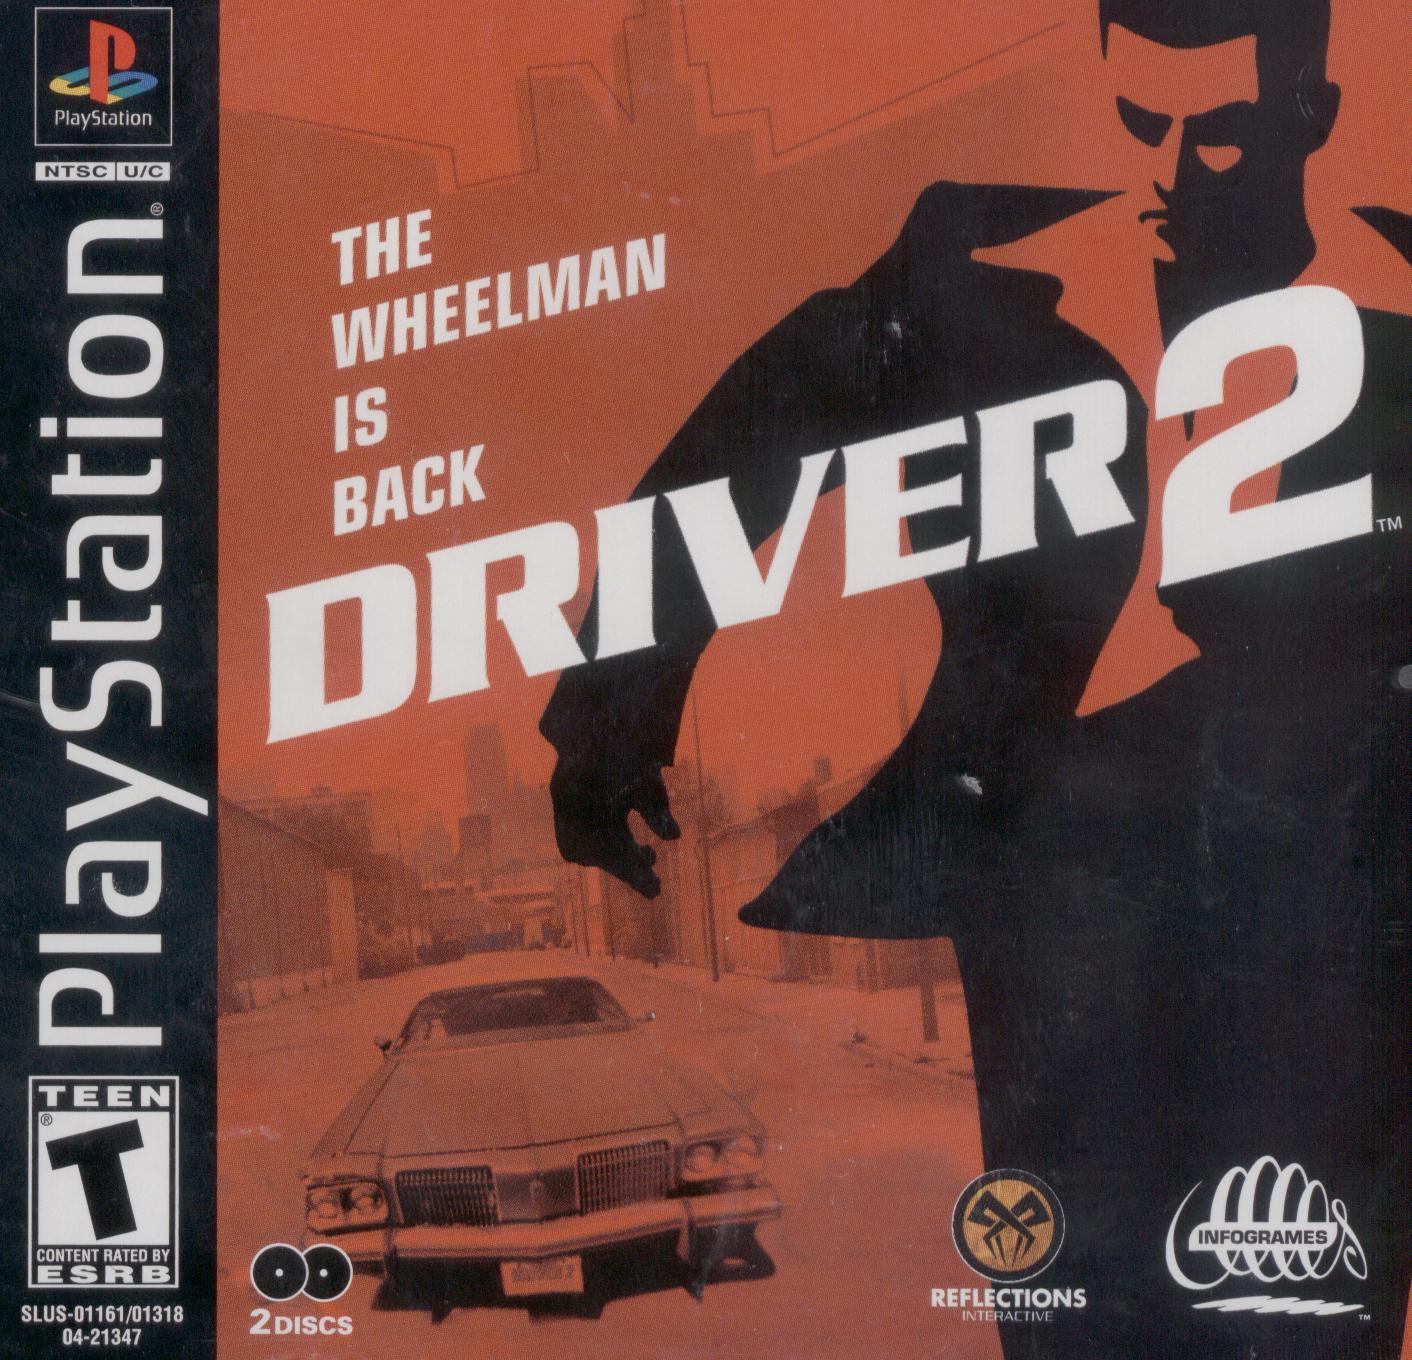 Driver 2 [Disc1of2] [SLUS-01161]